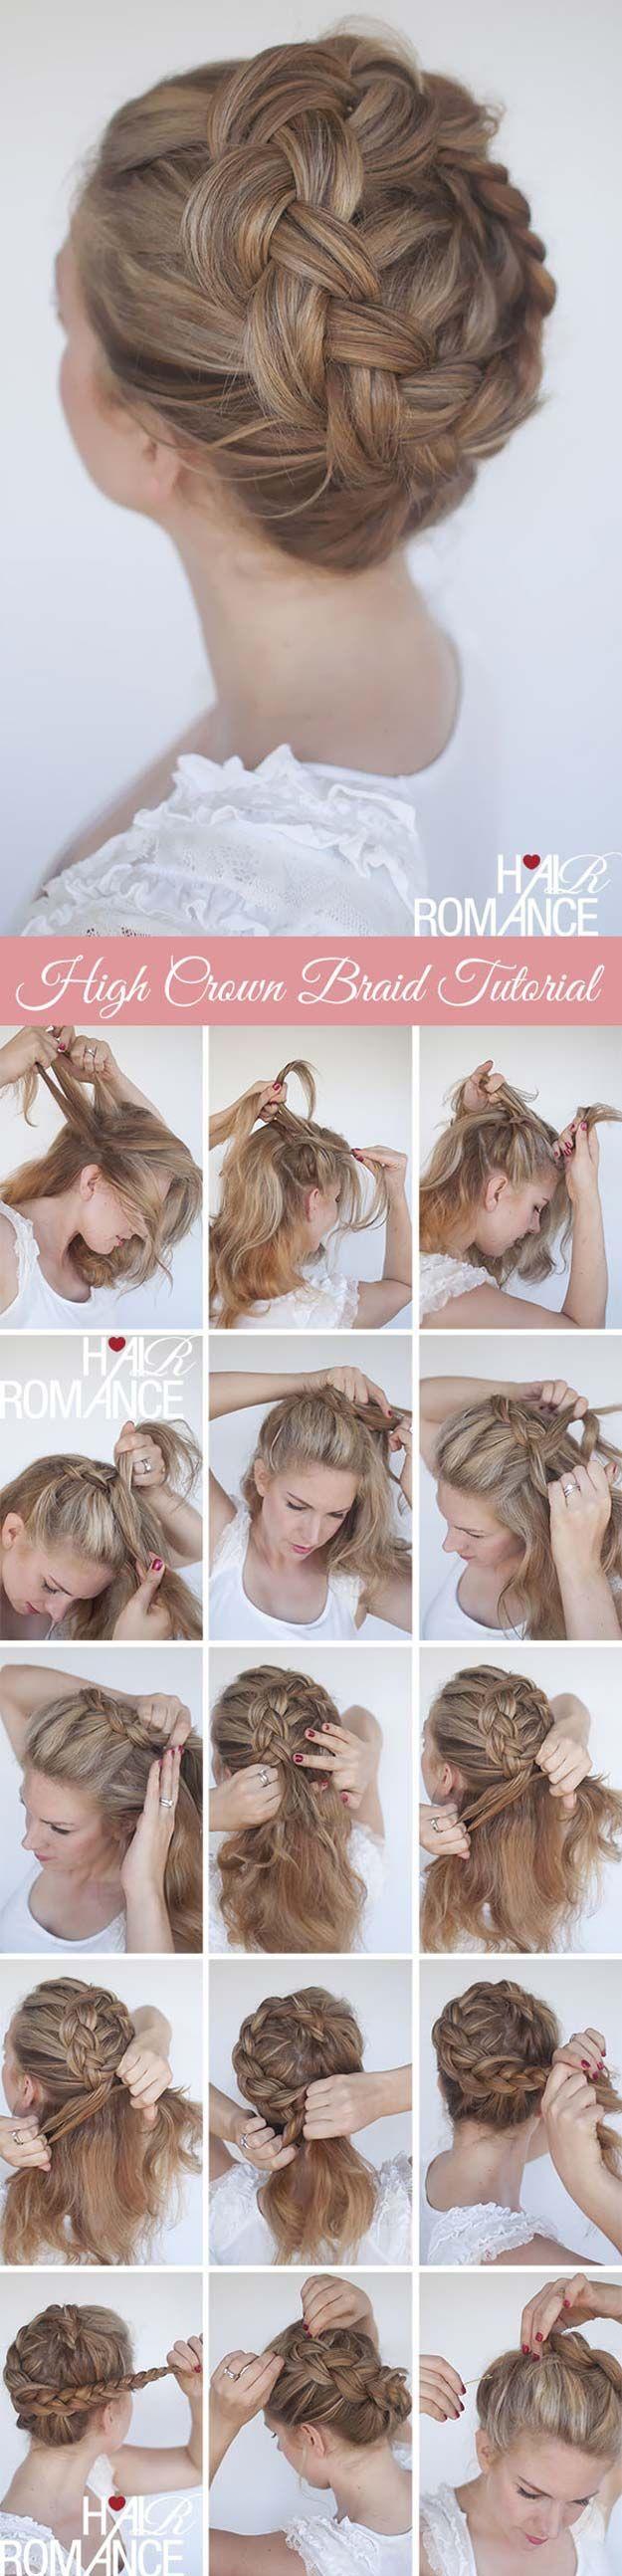 Best Hair Braiding Tutorials – High Braided Crown Tutorial – Easy Step by Step T